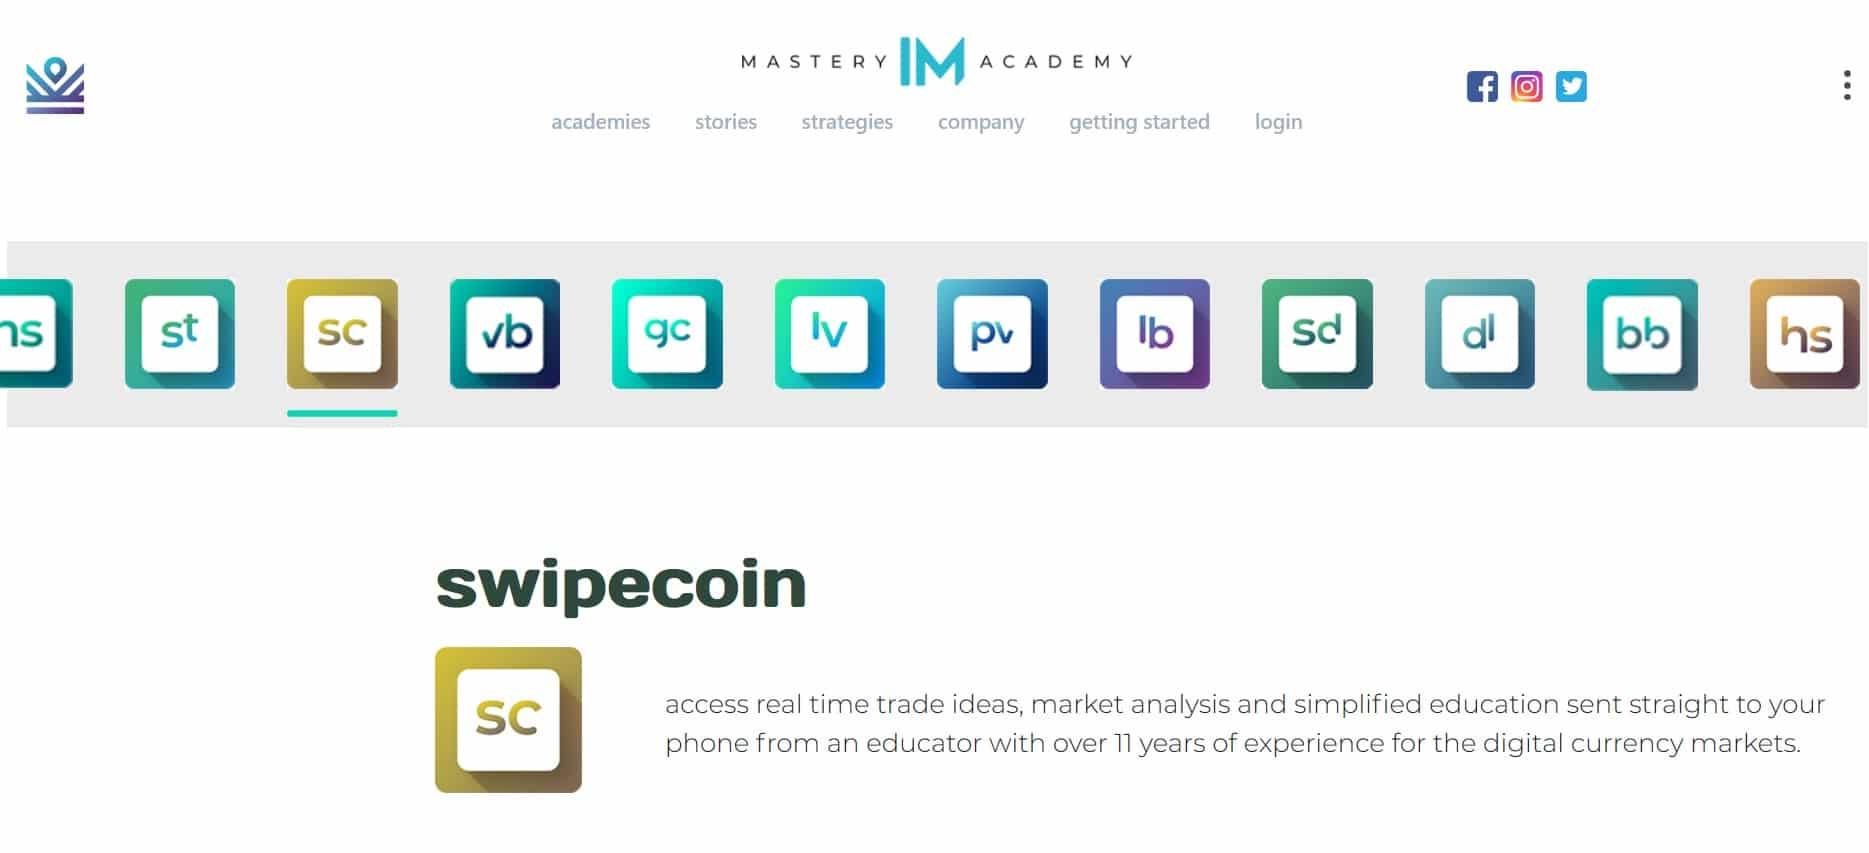 criptomonedas-IM-Mastery-Academy.